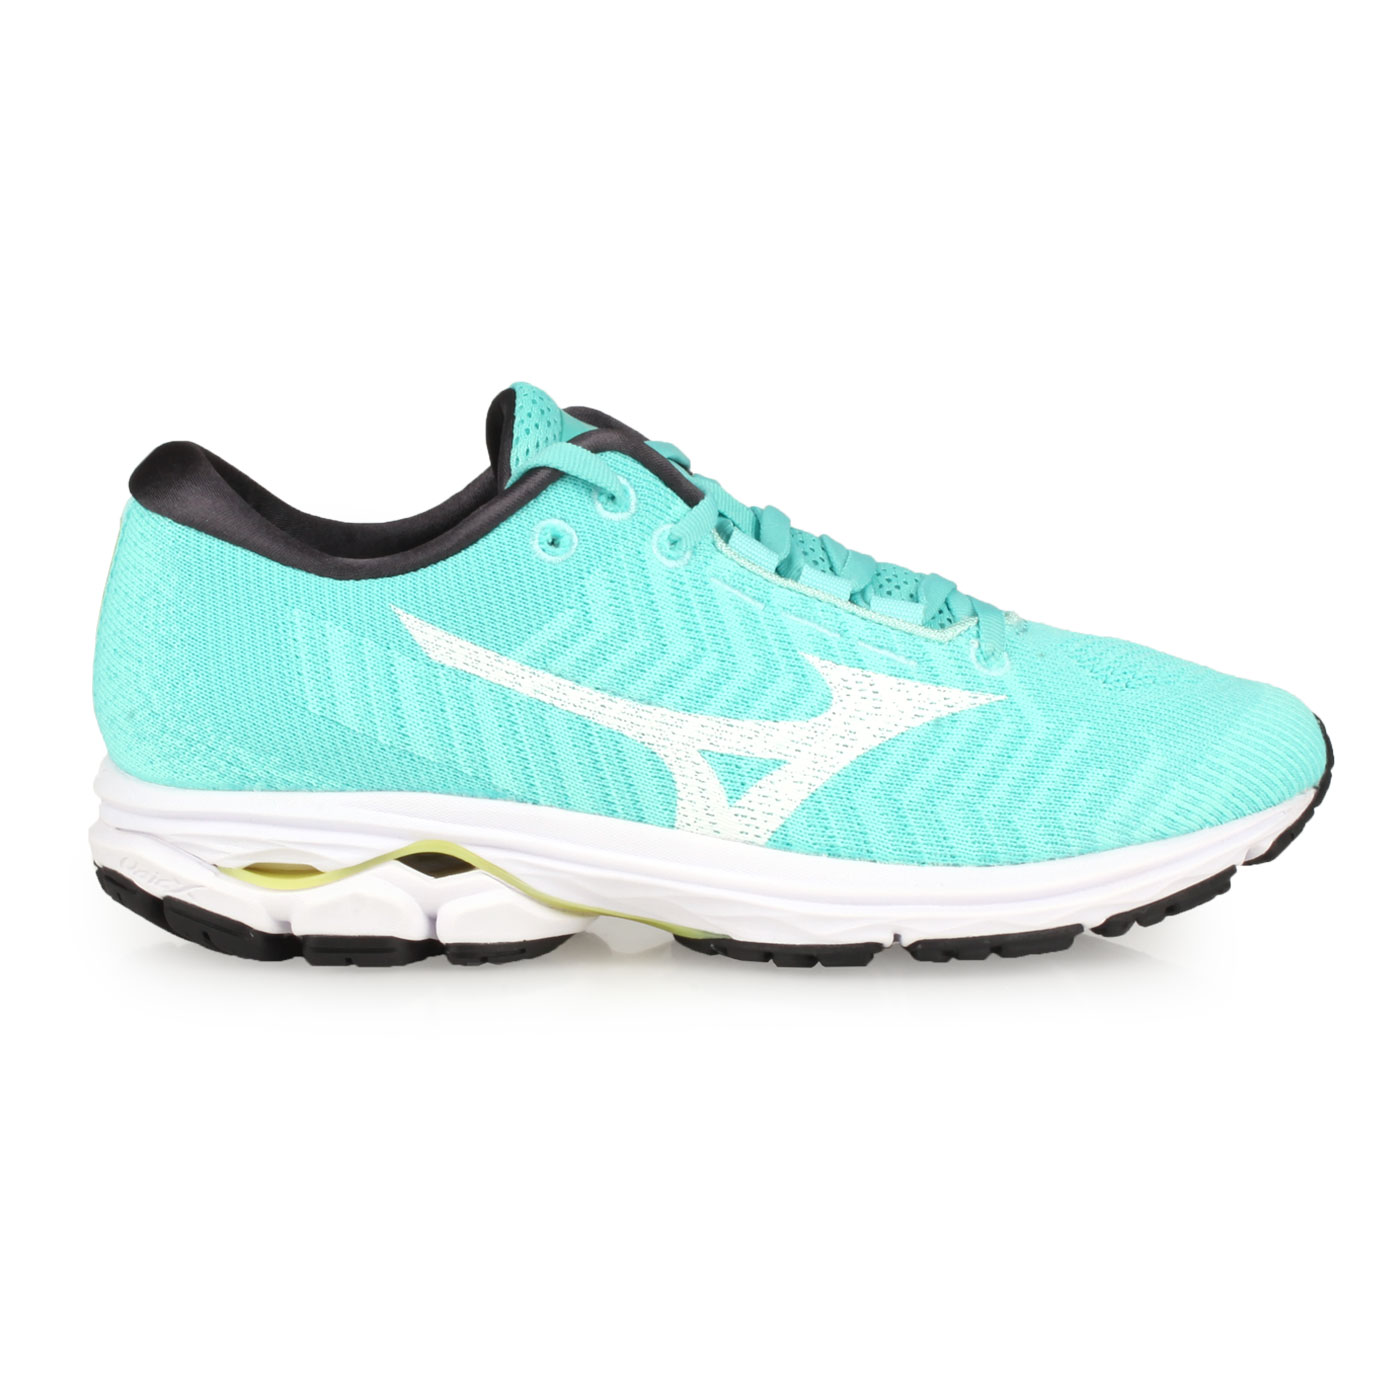 MIZUNO 女款慢跑鞋  @WAVE RIDER WAVEKNIT 3@J1GD192902 - 湖水綠白